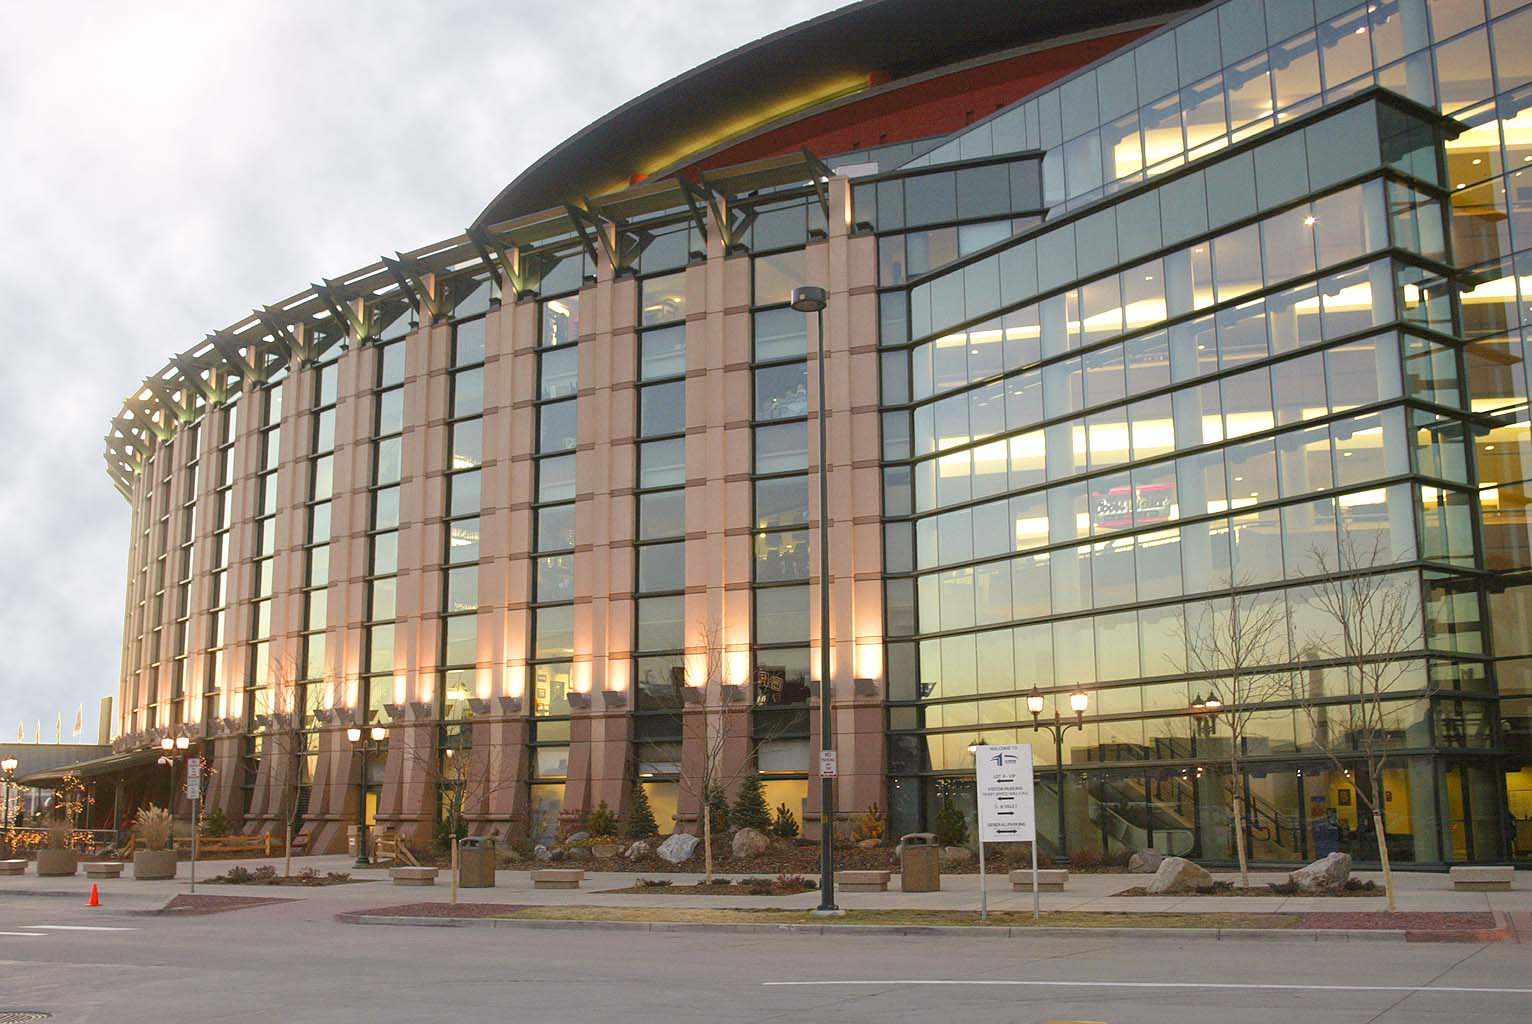 Pepsi Center stadium and convention hall in Denver, Colorado